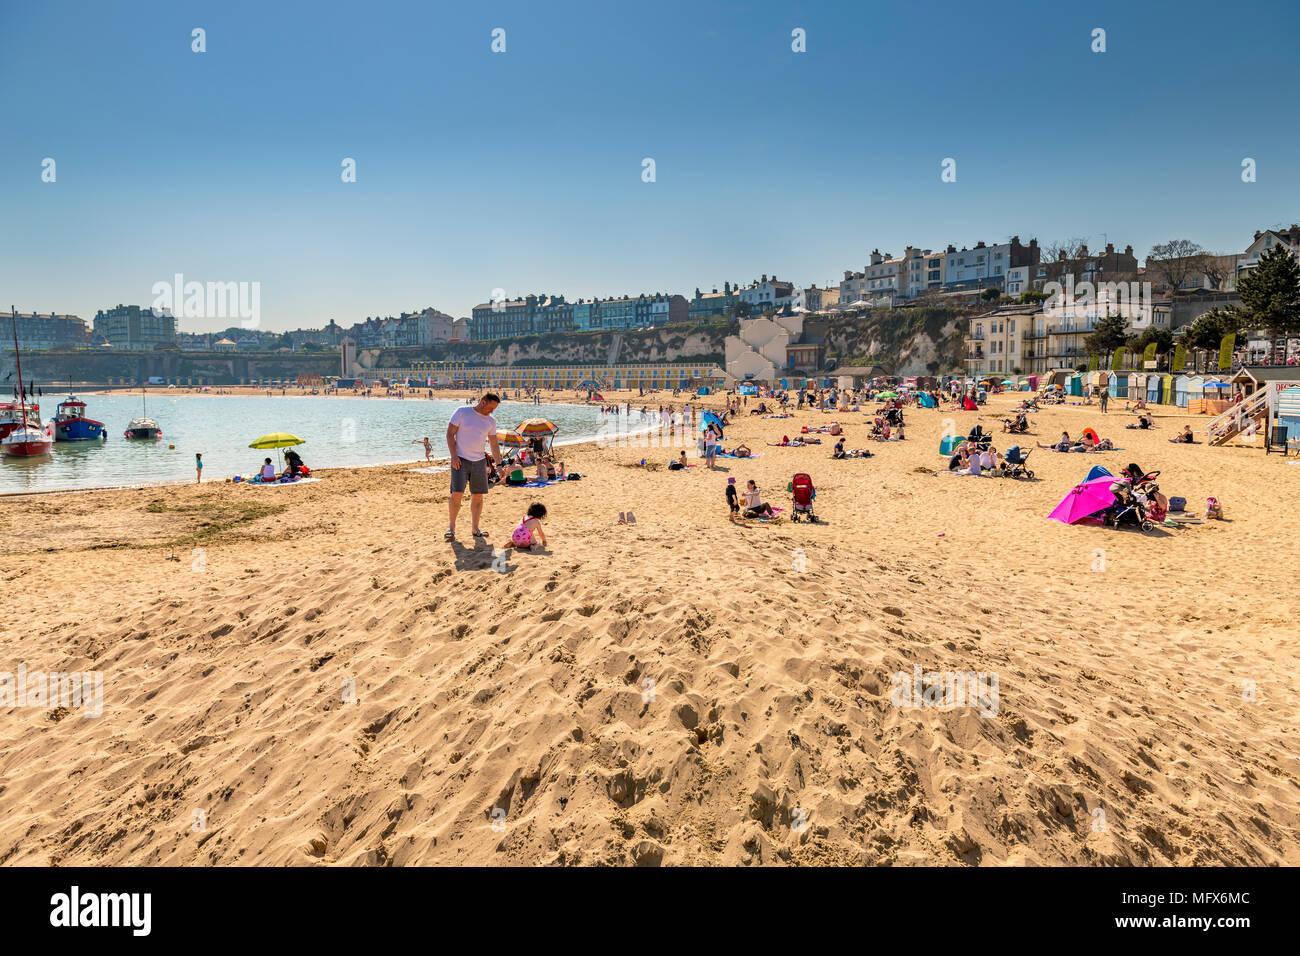 Viking Bay beach on a hot sunny day - Stock Image